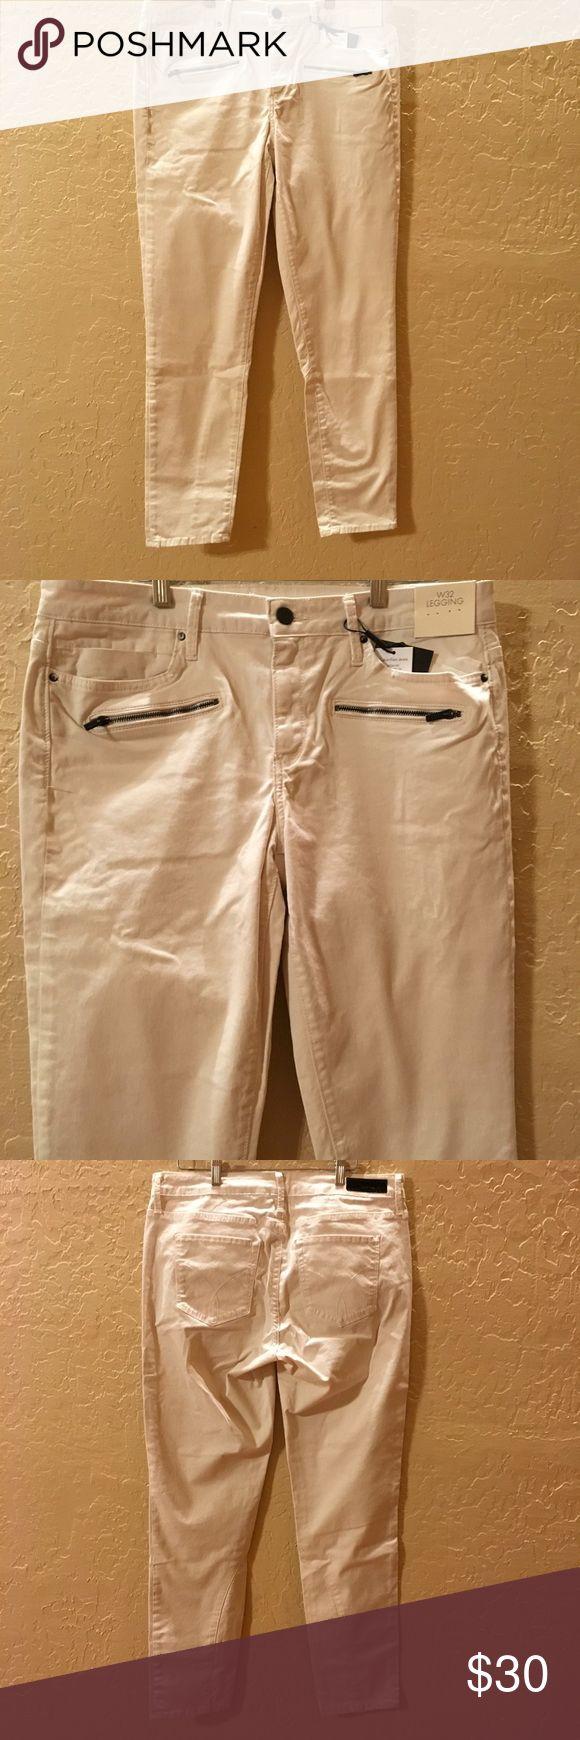 "NEW Womens 32X29 Calvin Klein Cream Jean Legging NEW with Tags Women's Calvin Klein Jeans Legging  Skinny  Color: Cream (Misty) White  Size 32X29  Measures:  34"" Waist 29"" Inseam Pet & Smoke free home  IT#922 Calvin Klein Jeans Skinny"